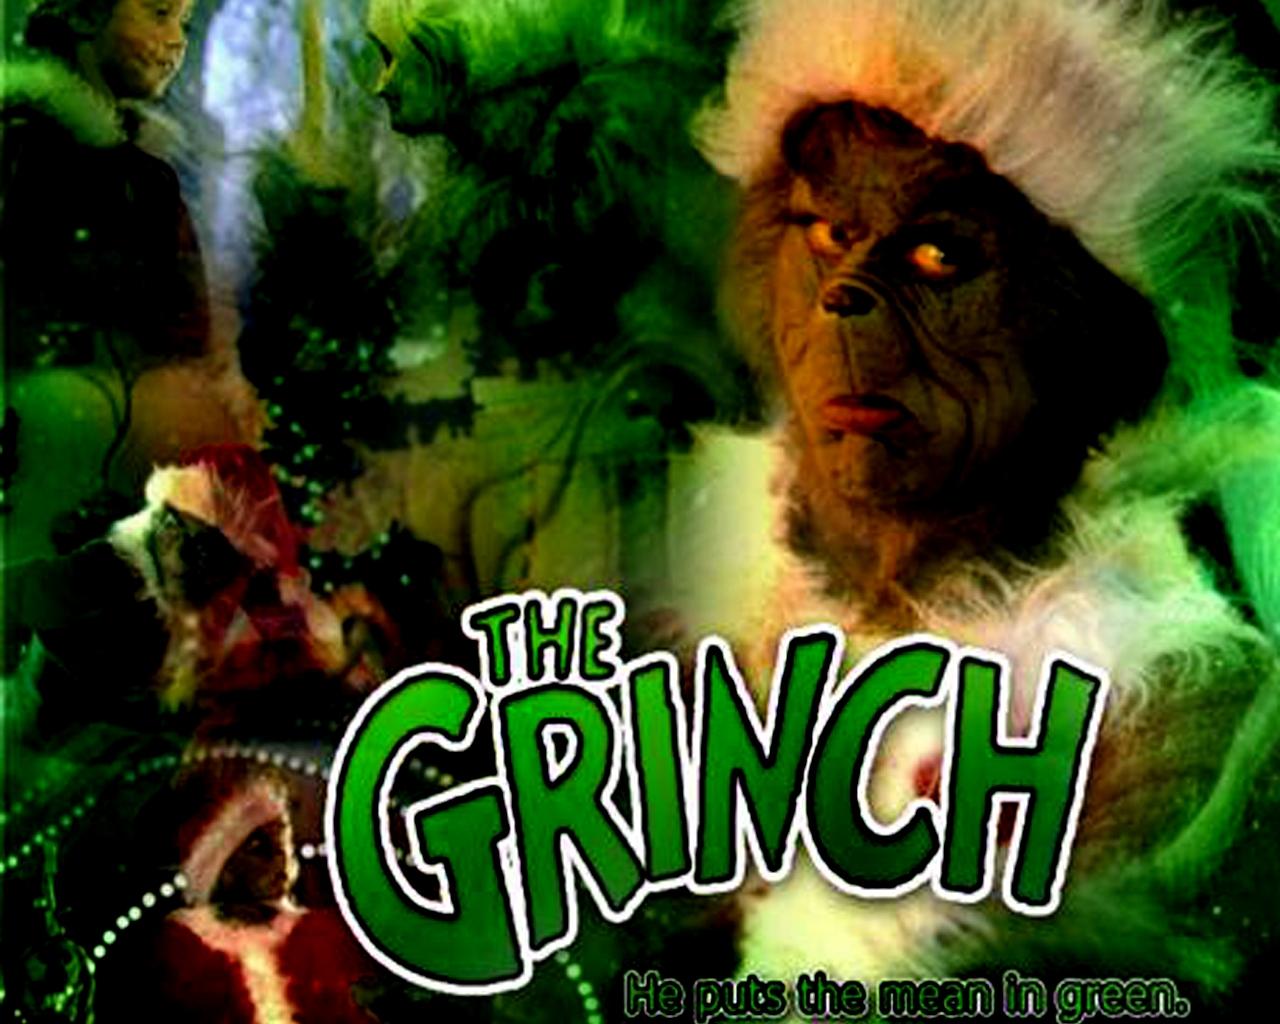 Jim Carey as The Grinch Christmas Wallpaper   Christmas Cartoon 1280x1024